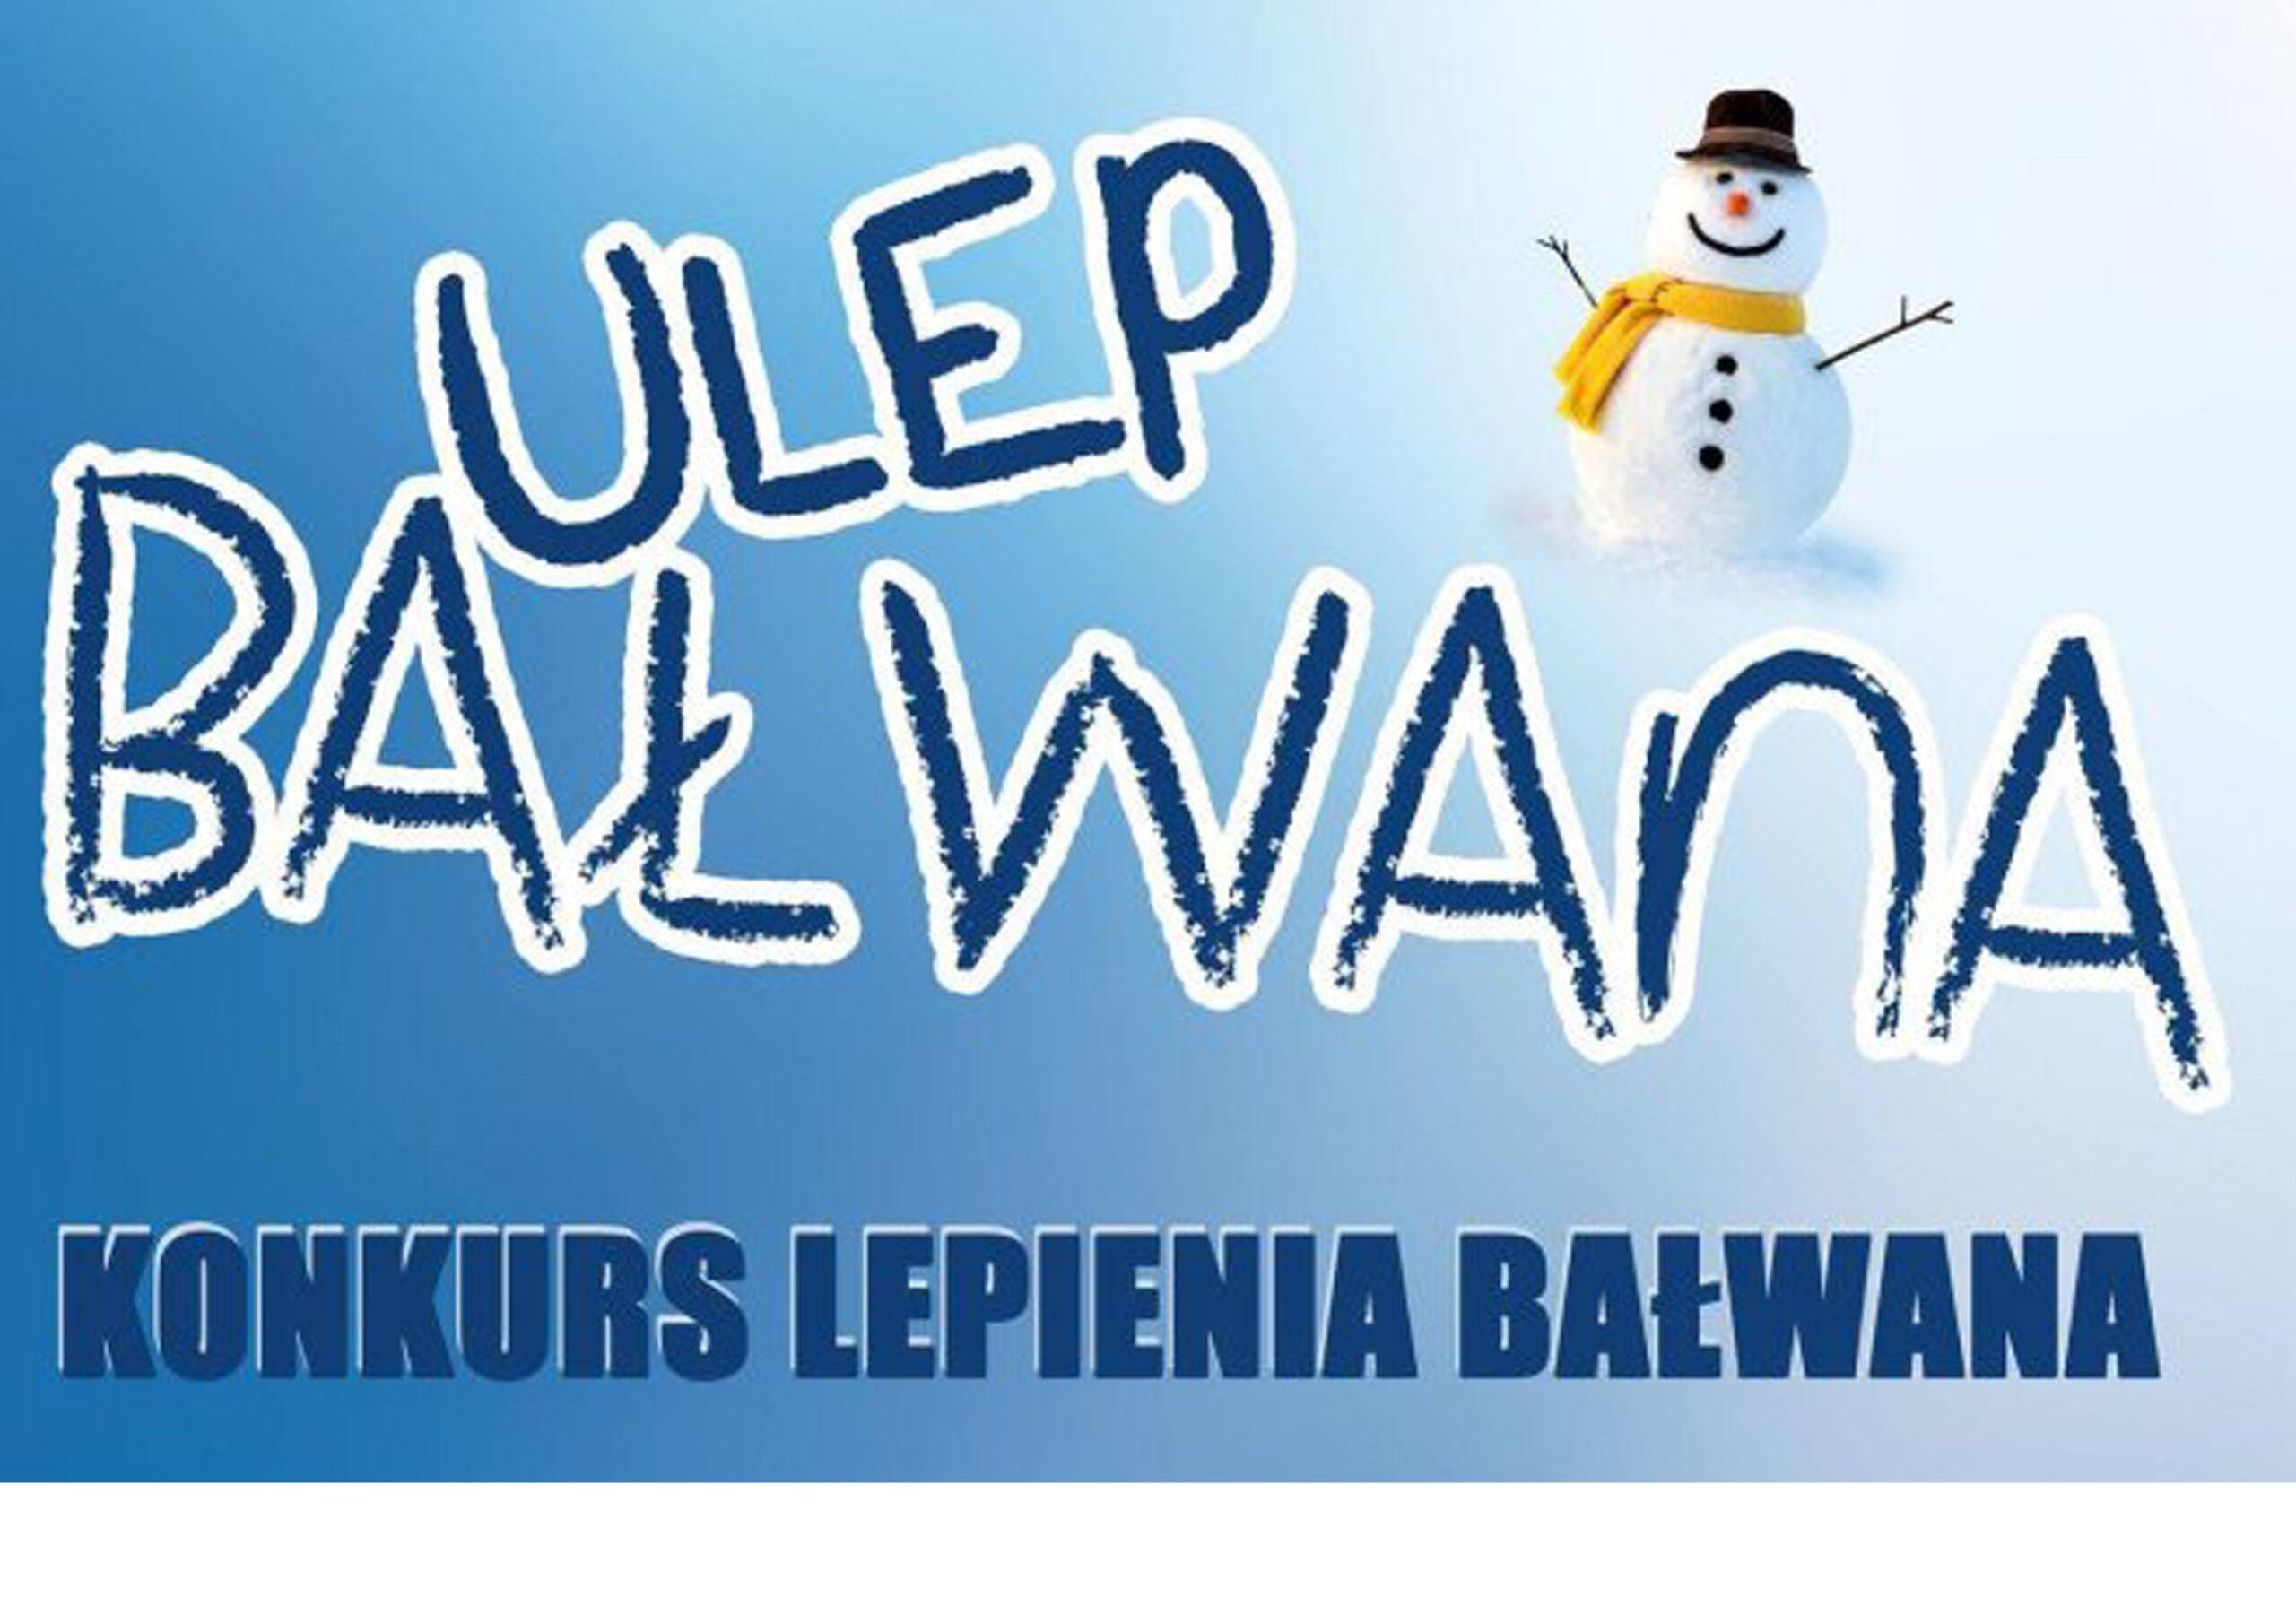 logo konkursu ulep bałwana